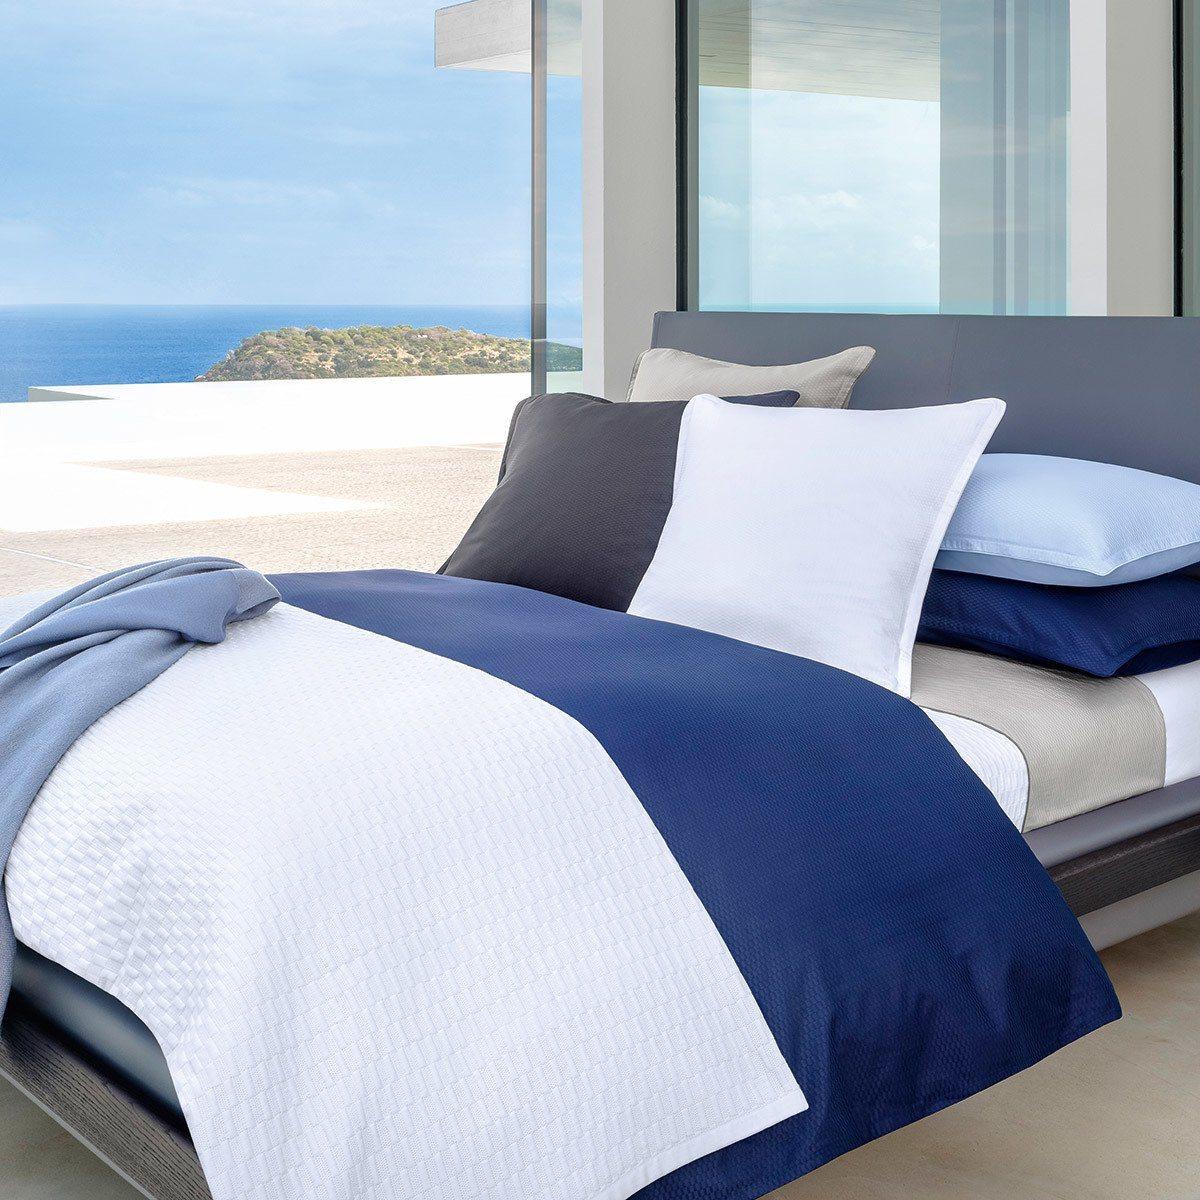 Bettbezug »LOFT«, Hugo Boss Home (1 St) | Heimtextilien > Bettwäsche und Laken > Wendebettwäsche | Hugo Boss Home